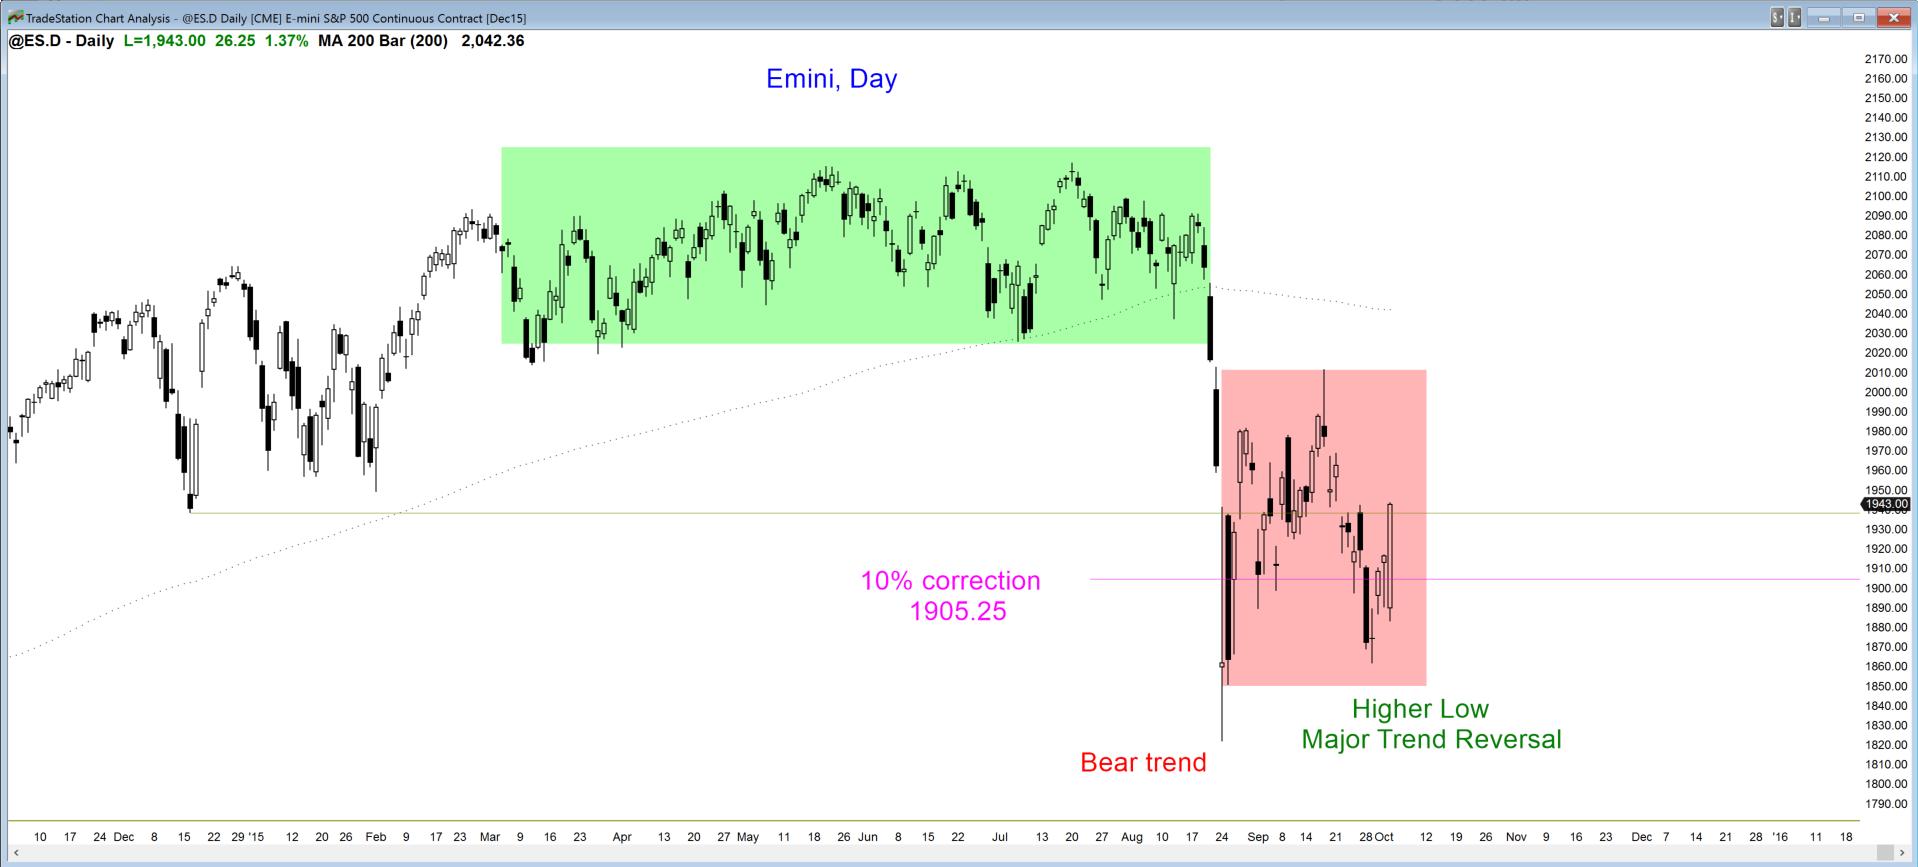 Emini day trading strategies